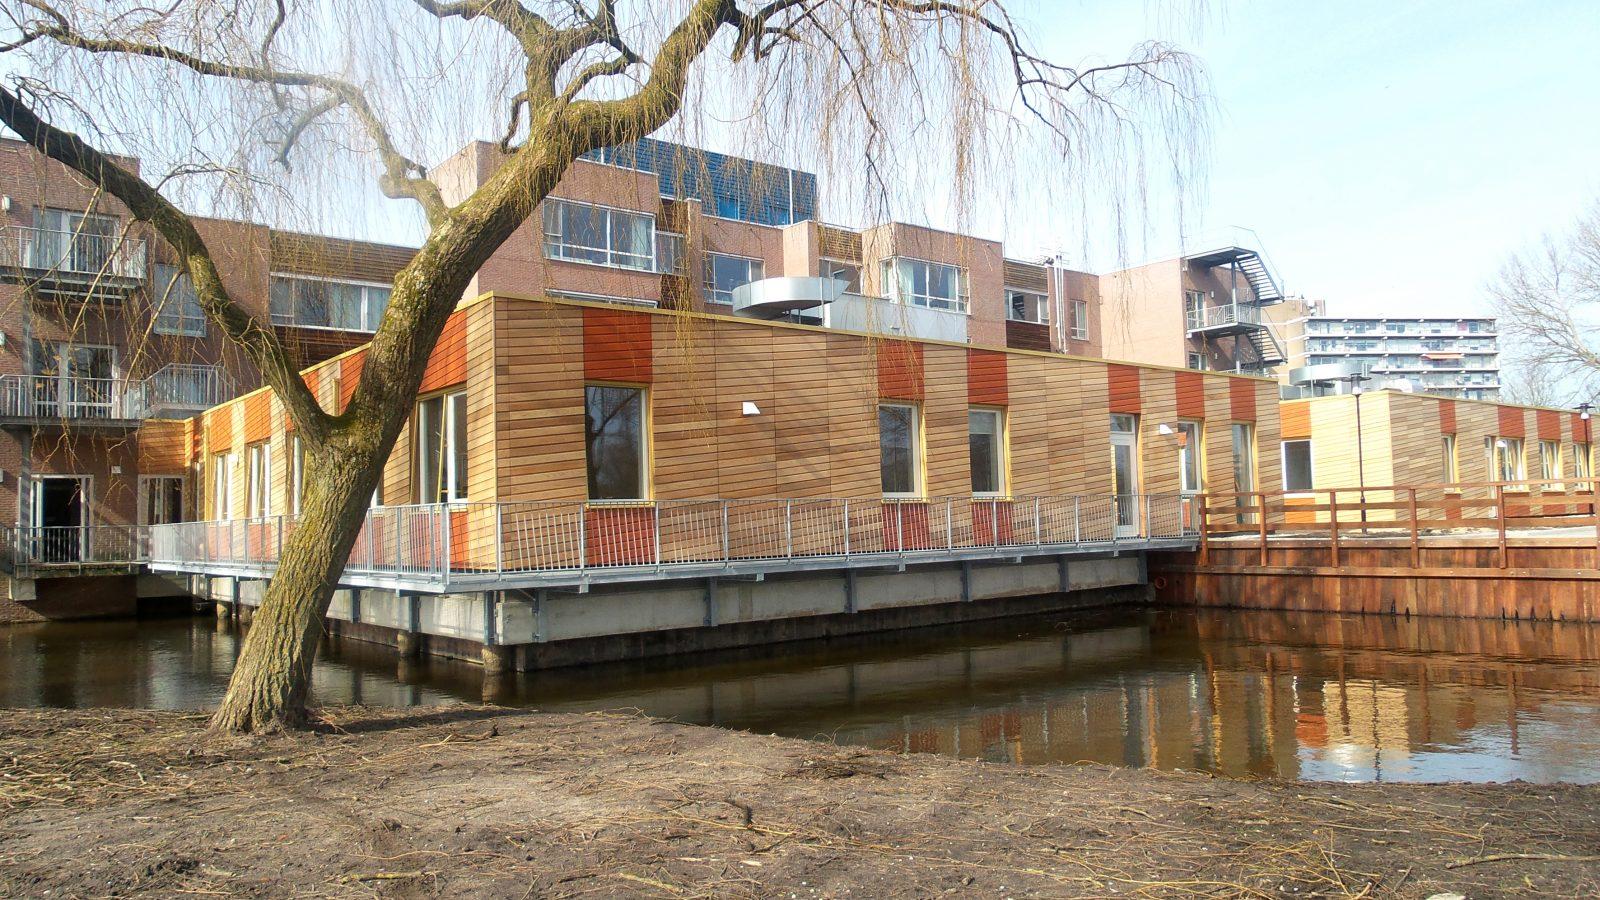 Medisch centrum novawhere purmerend mooi noord holland